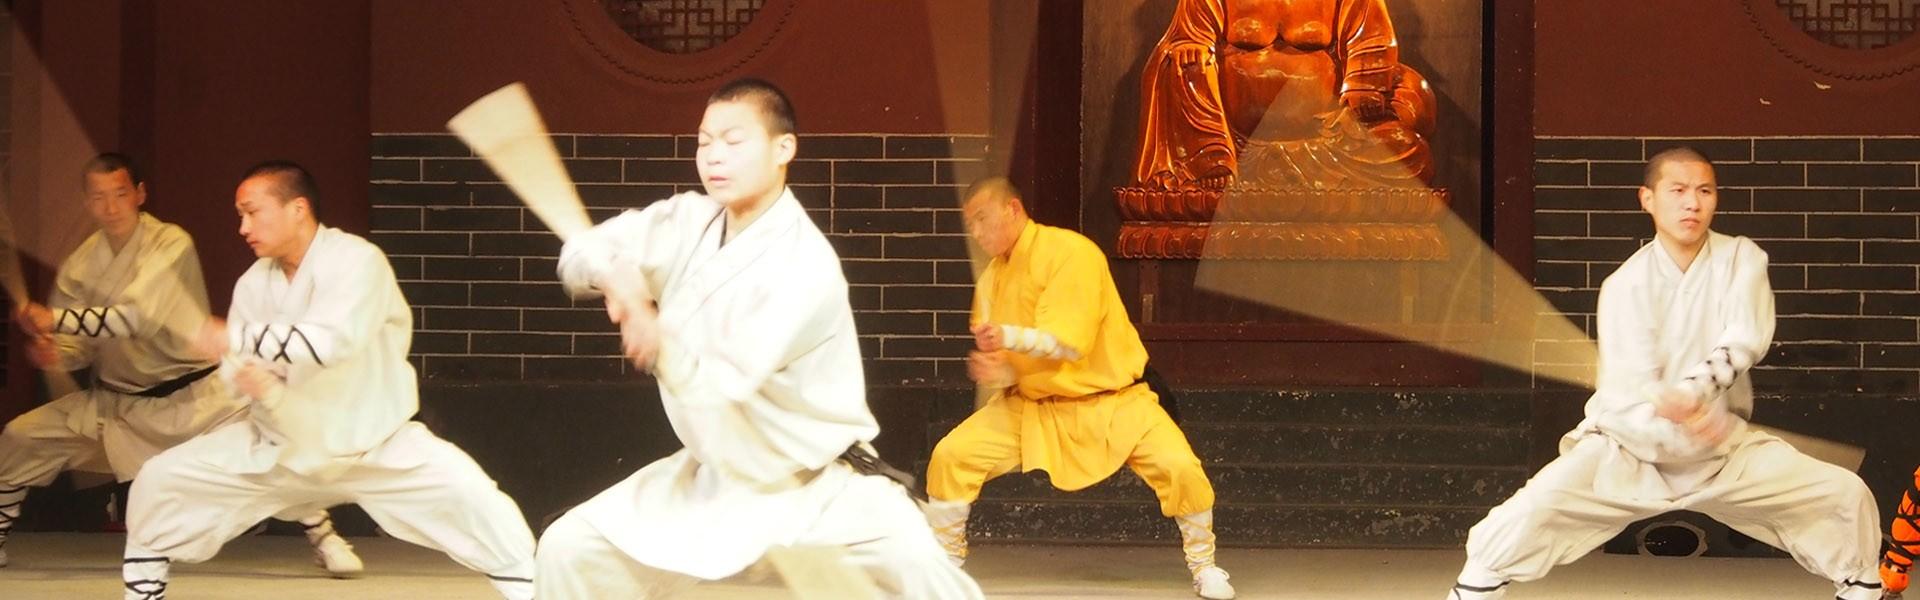 KungfuShow'1920x600'1